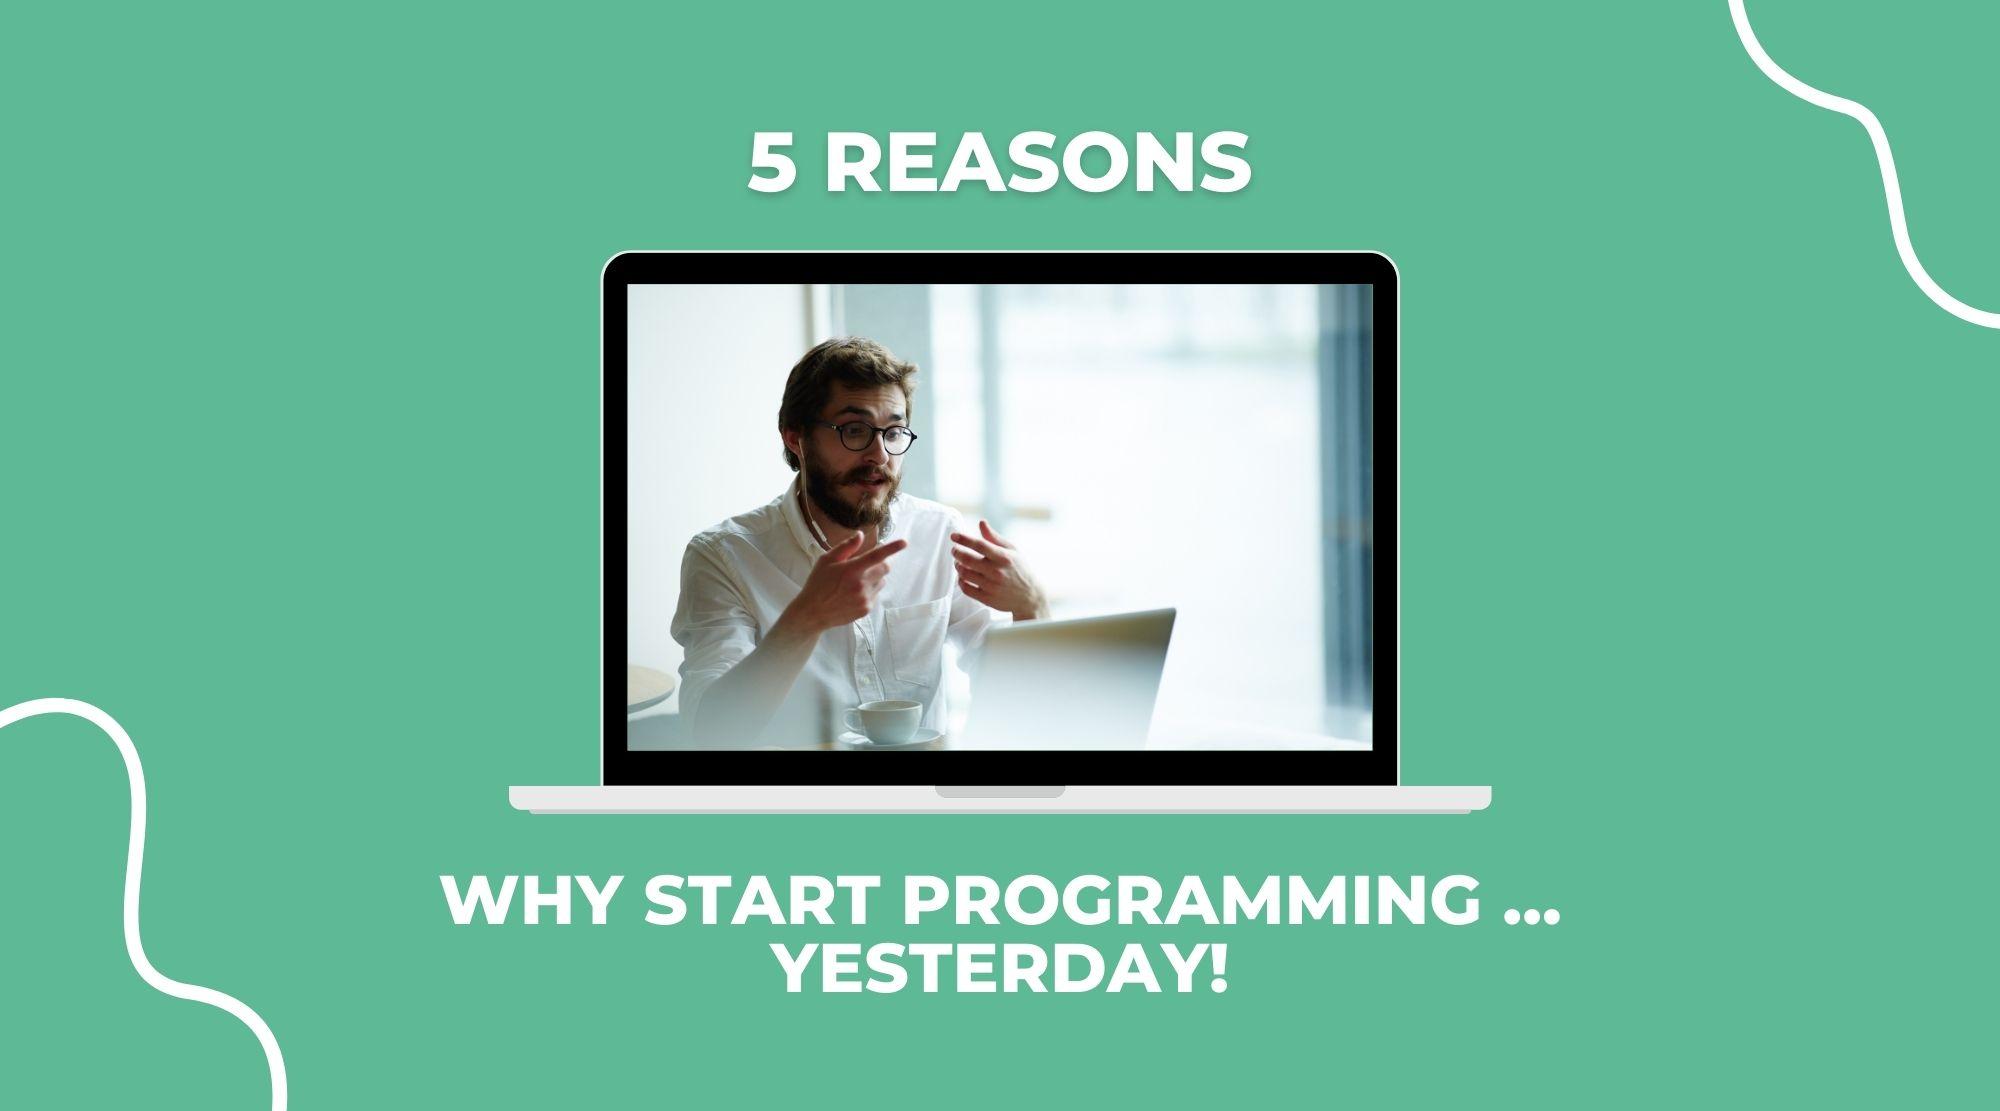 5 reasons to start programming … yesterday!